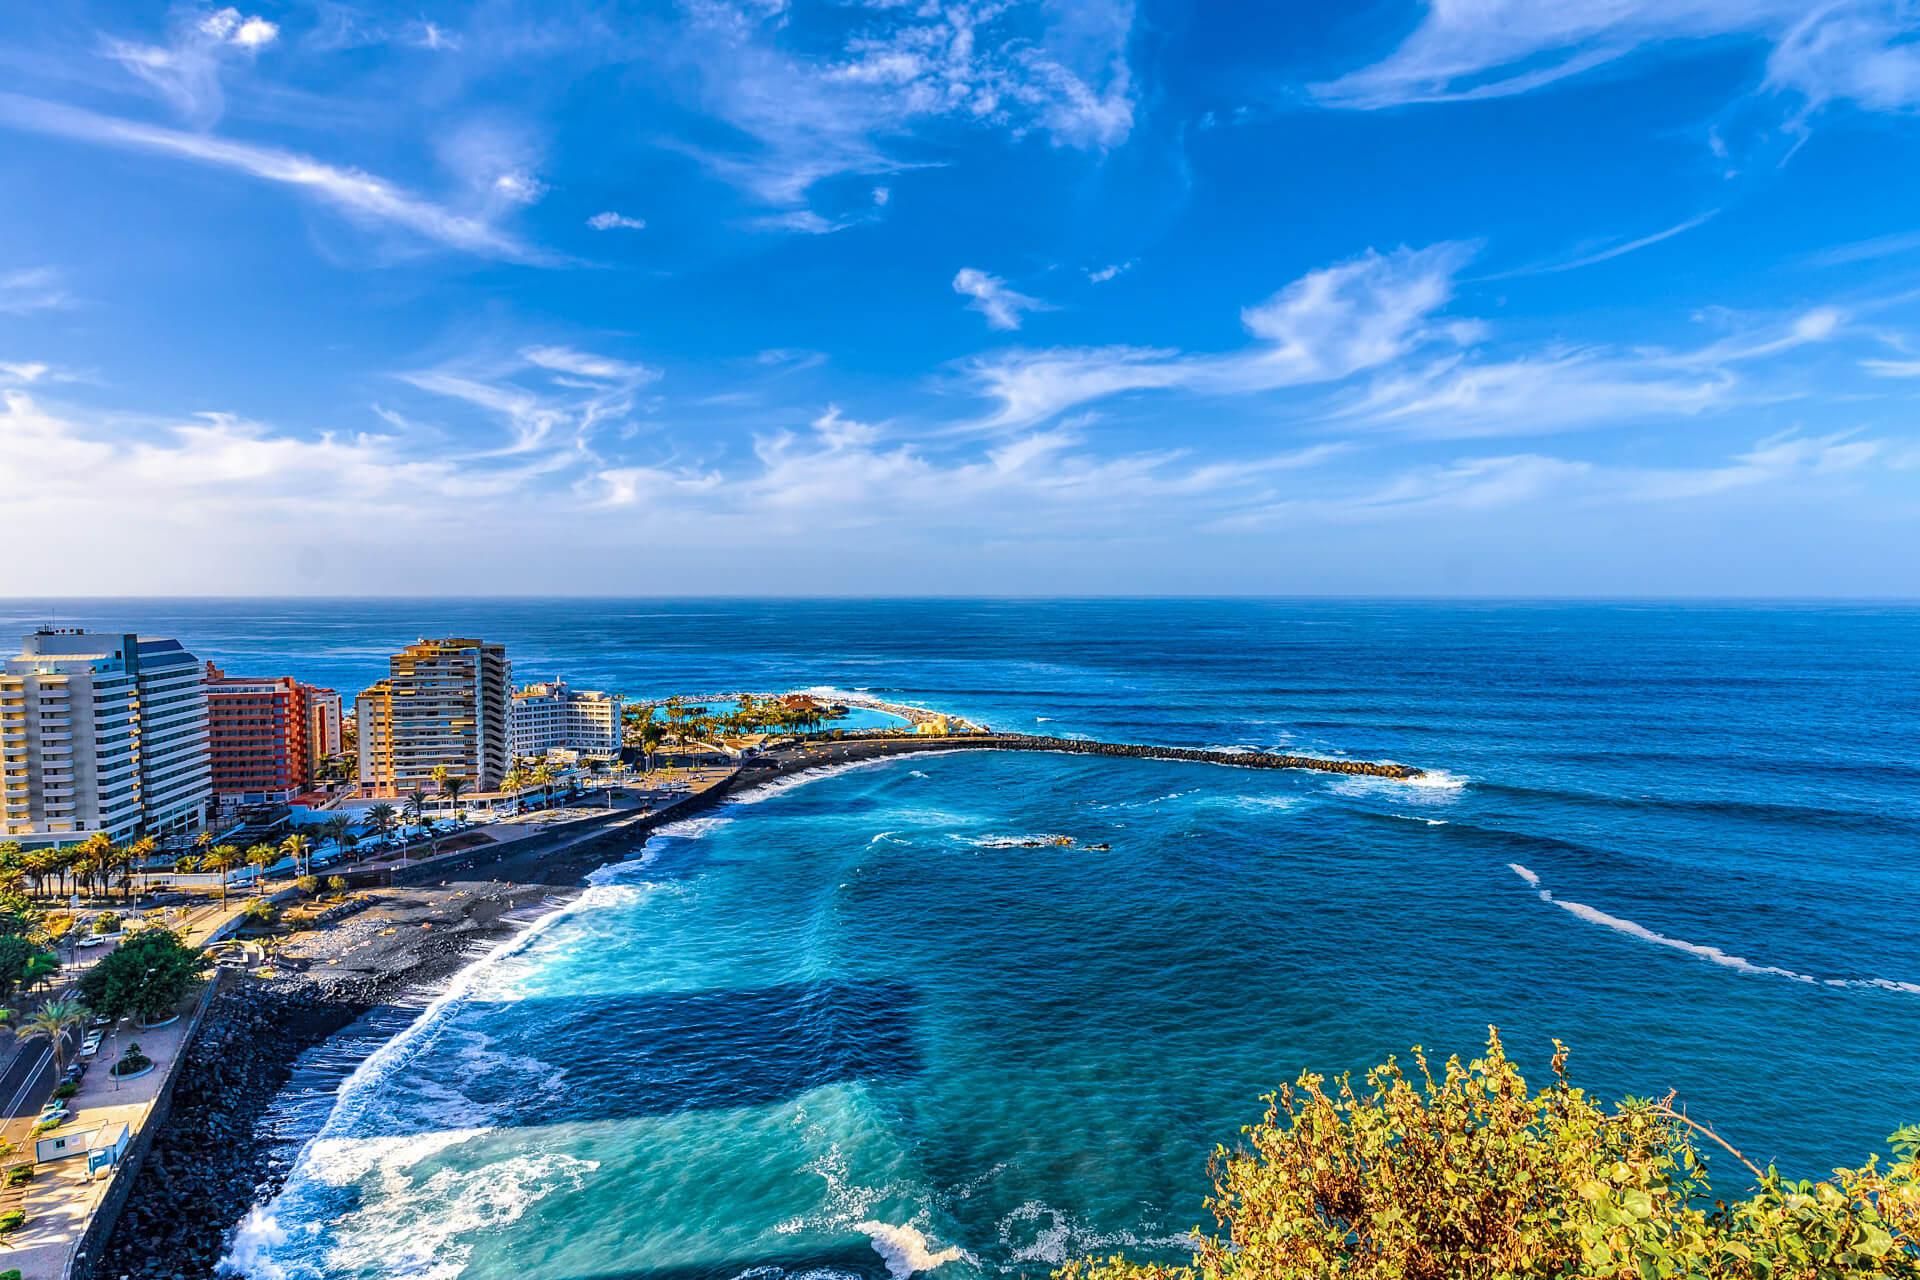 Tenerife - Destinations Where Summer Never Ends